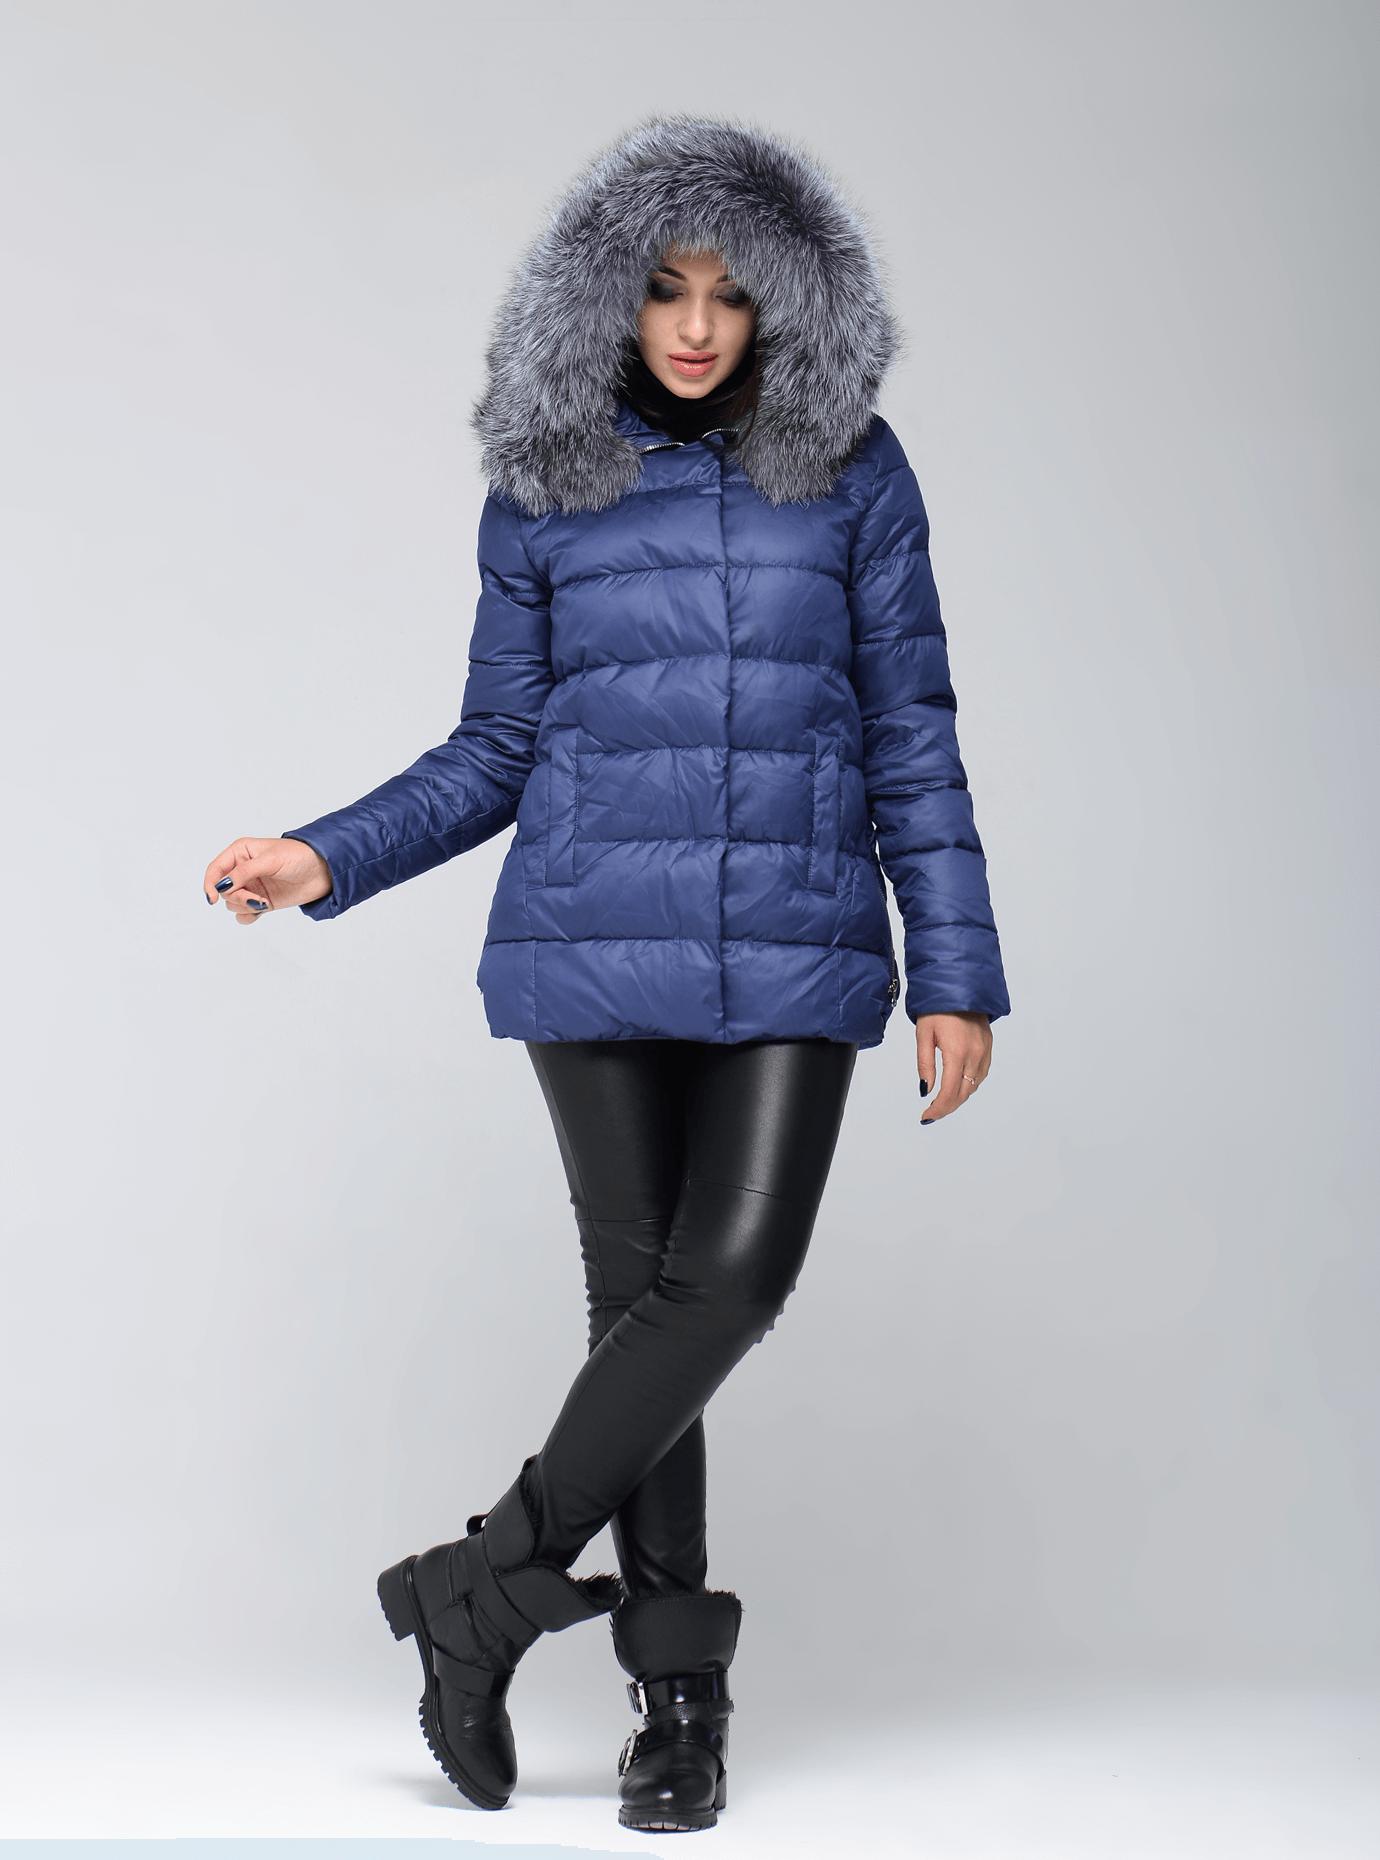 Зимняя куртка женская на молнии Синий L (05-CH19107): фото - Alster.ua